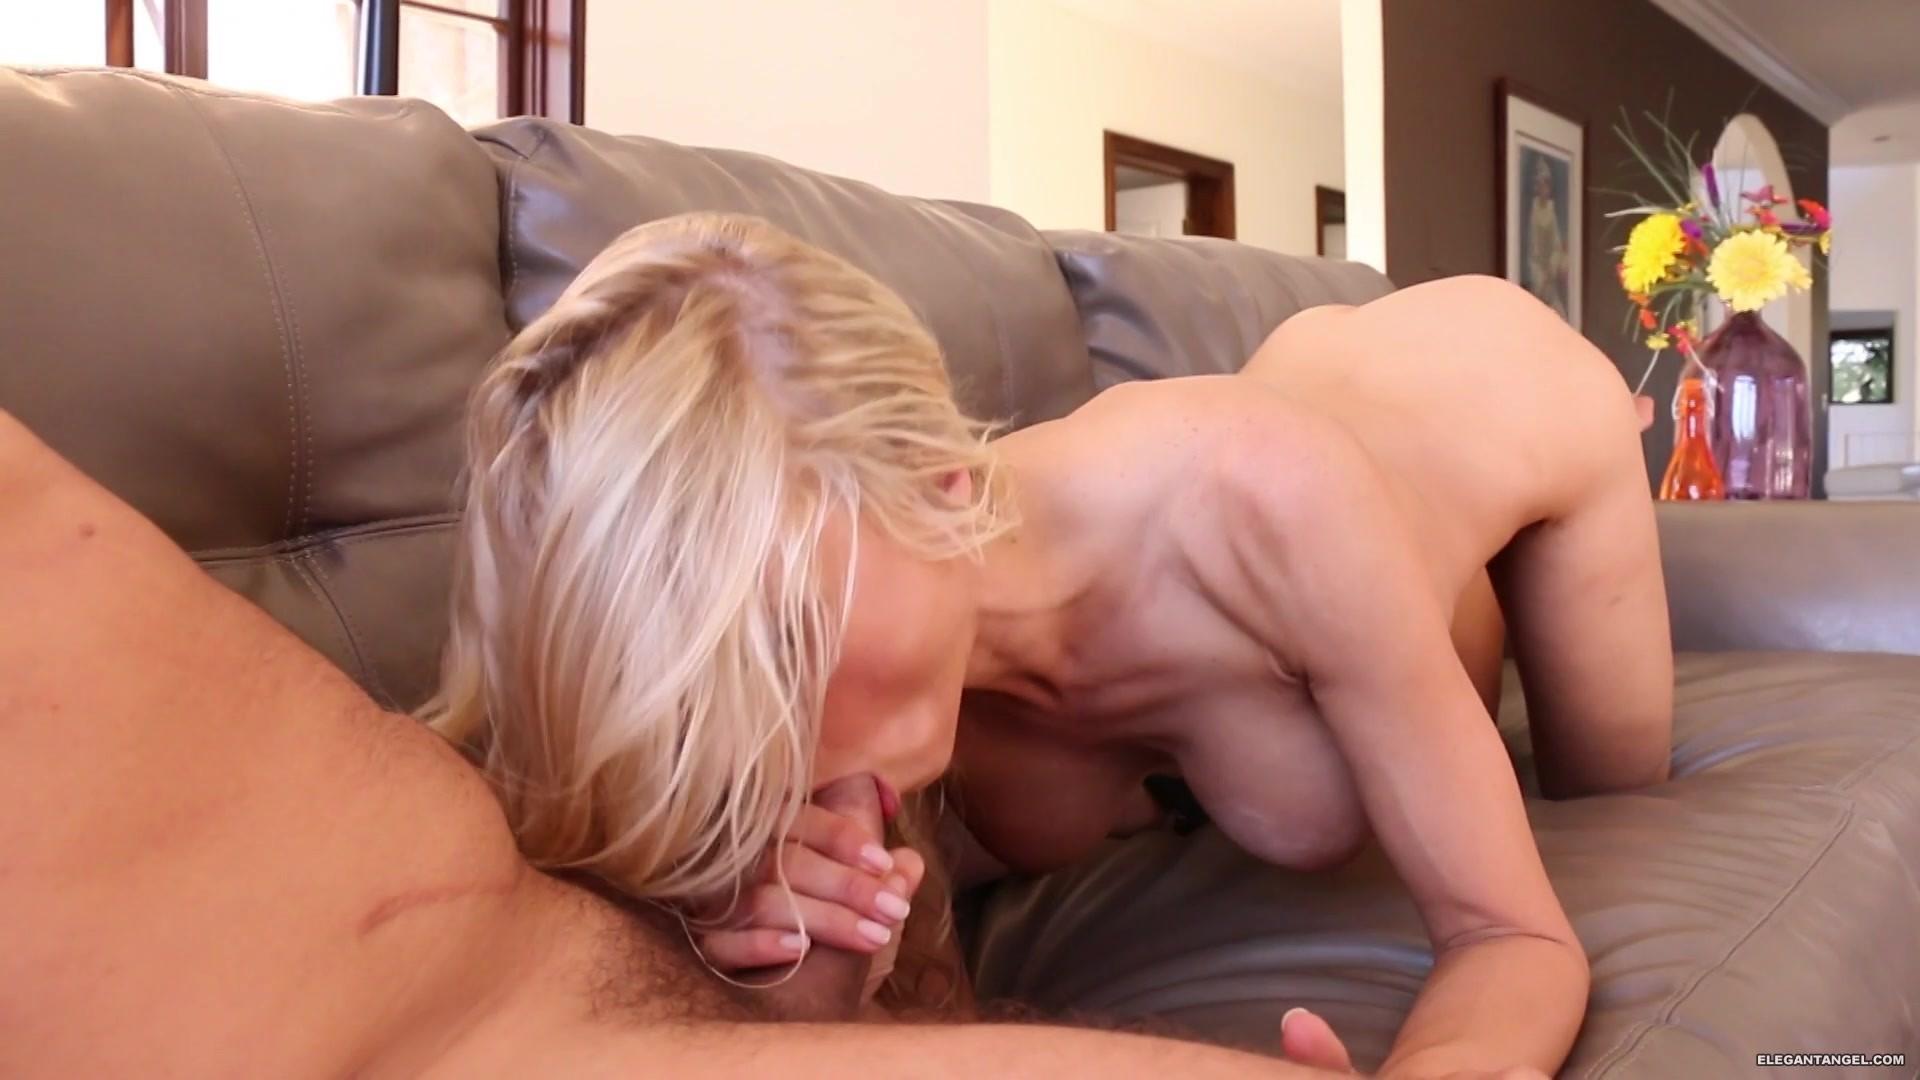 Wife spanking husbands